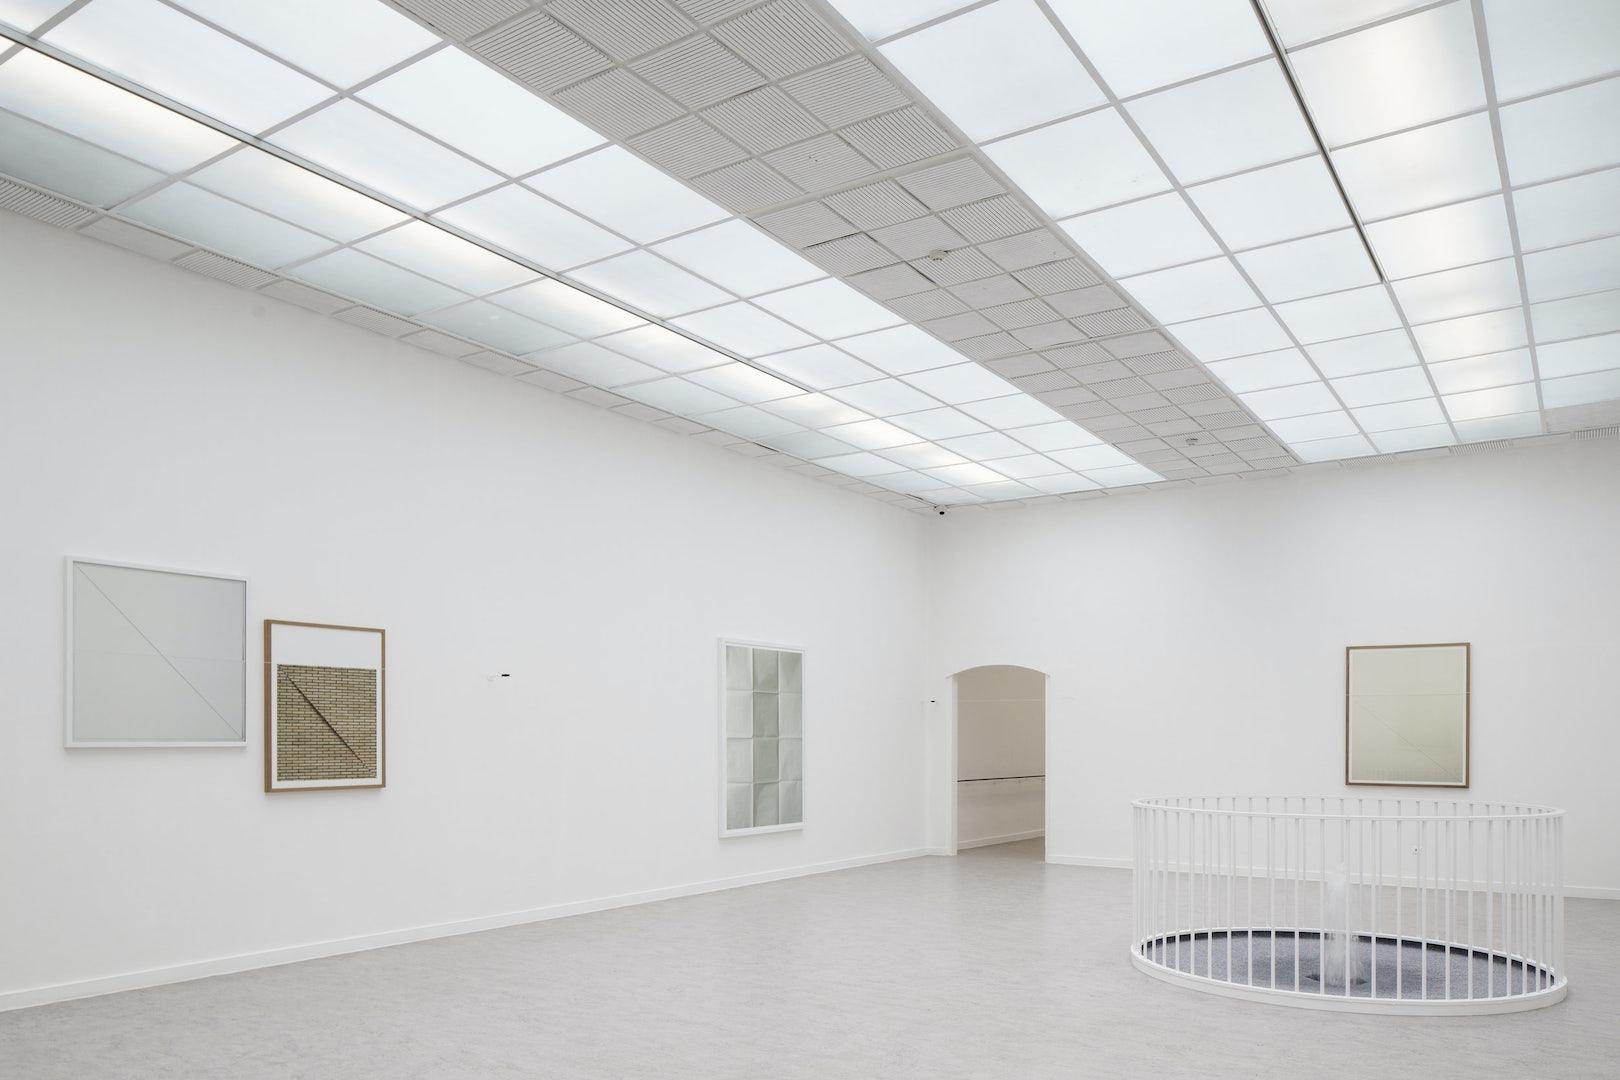 exhibition room of Z33